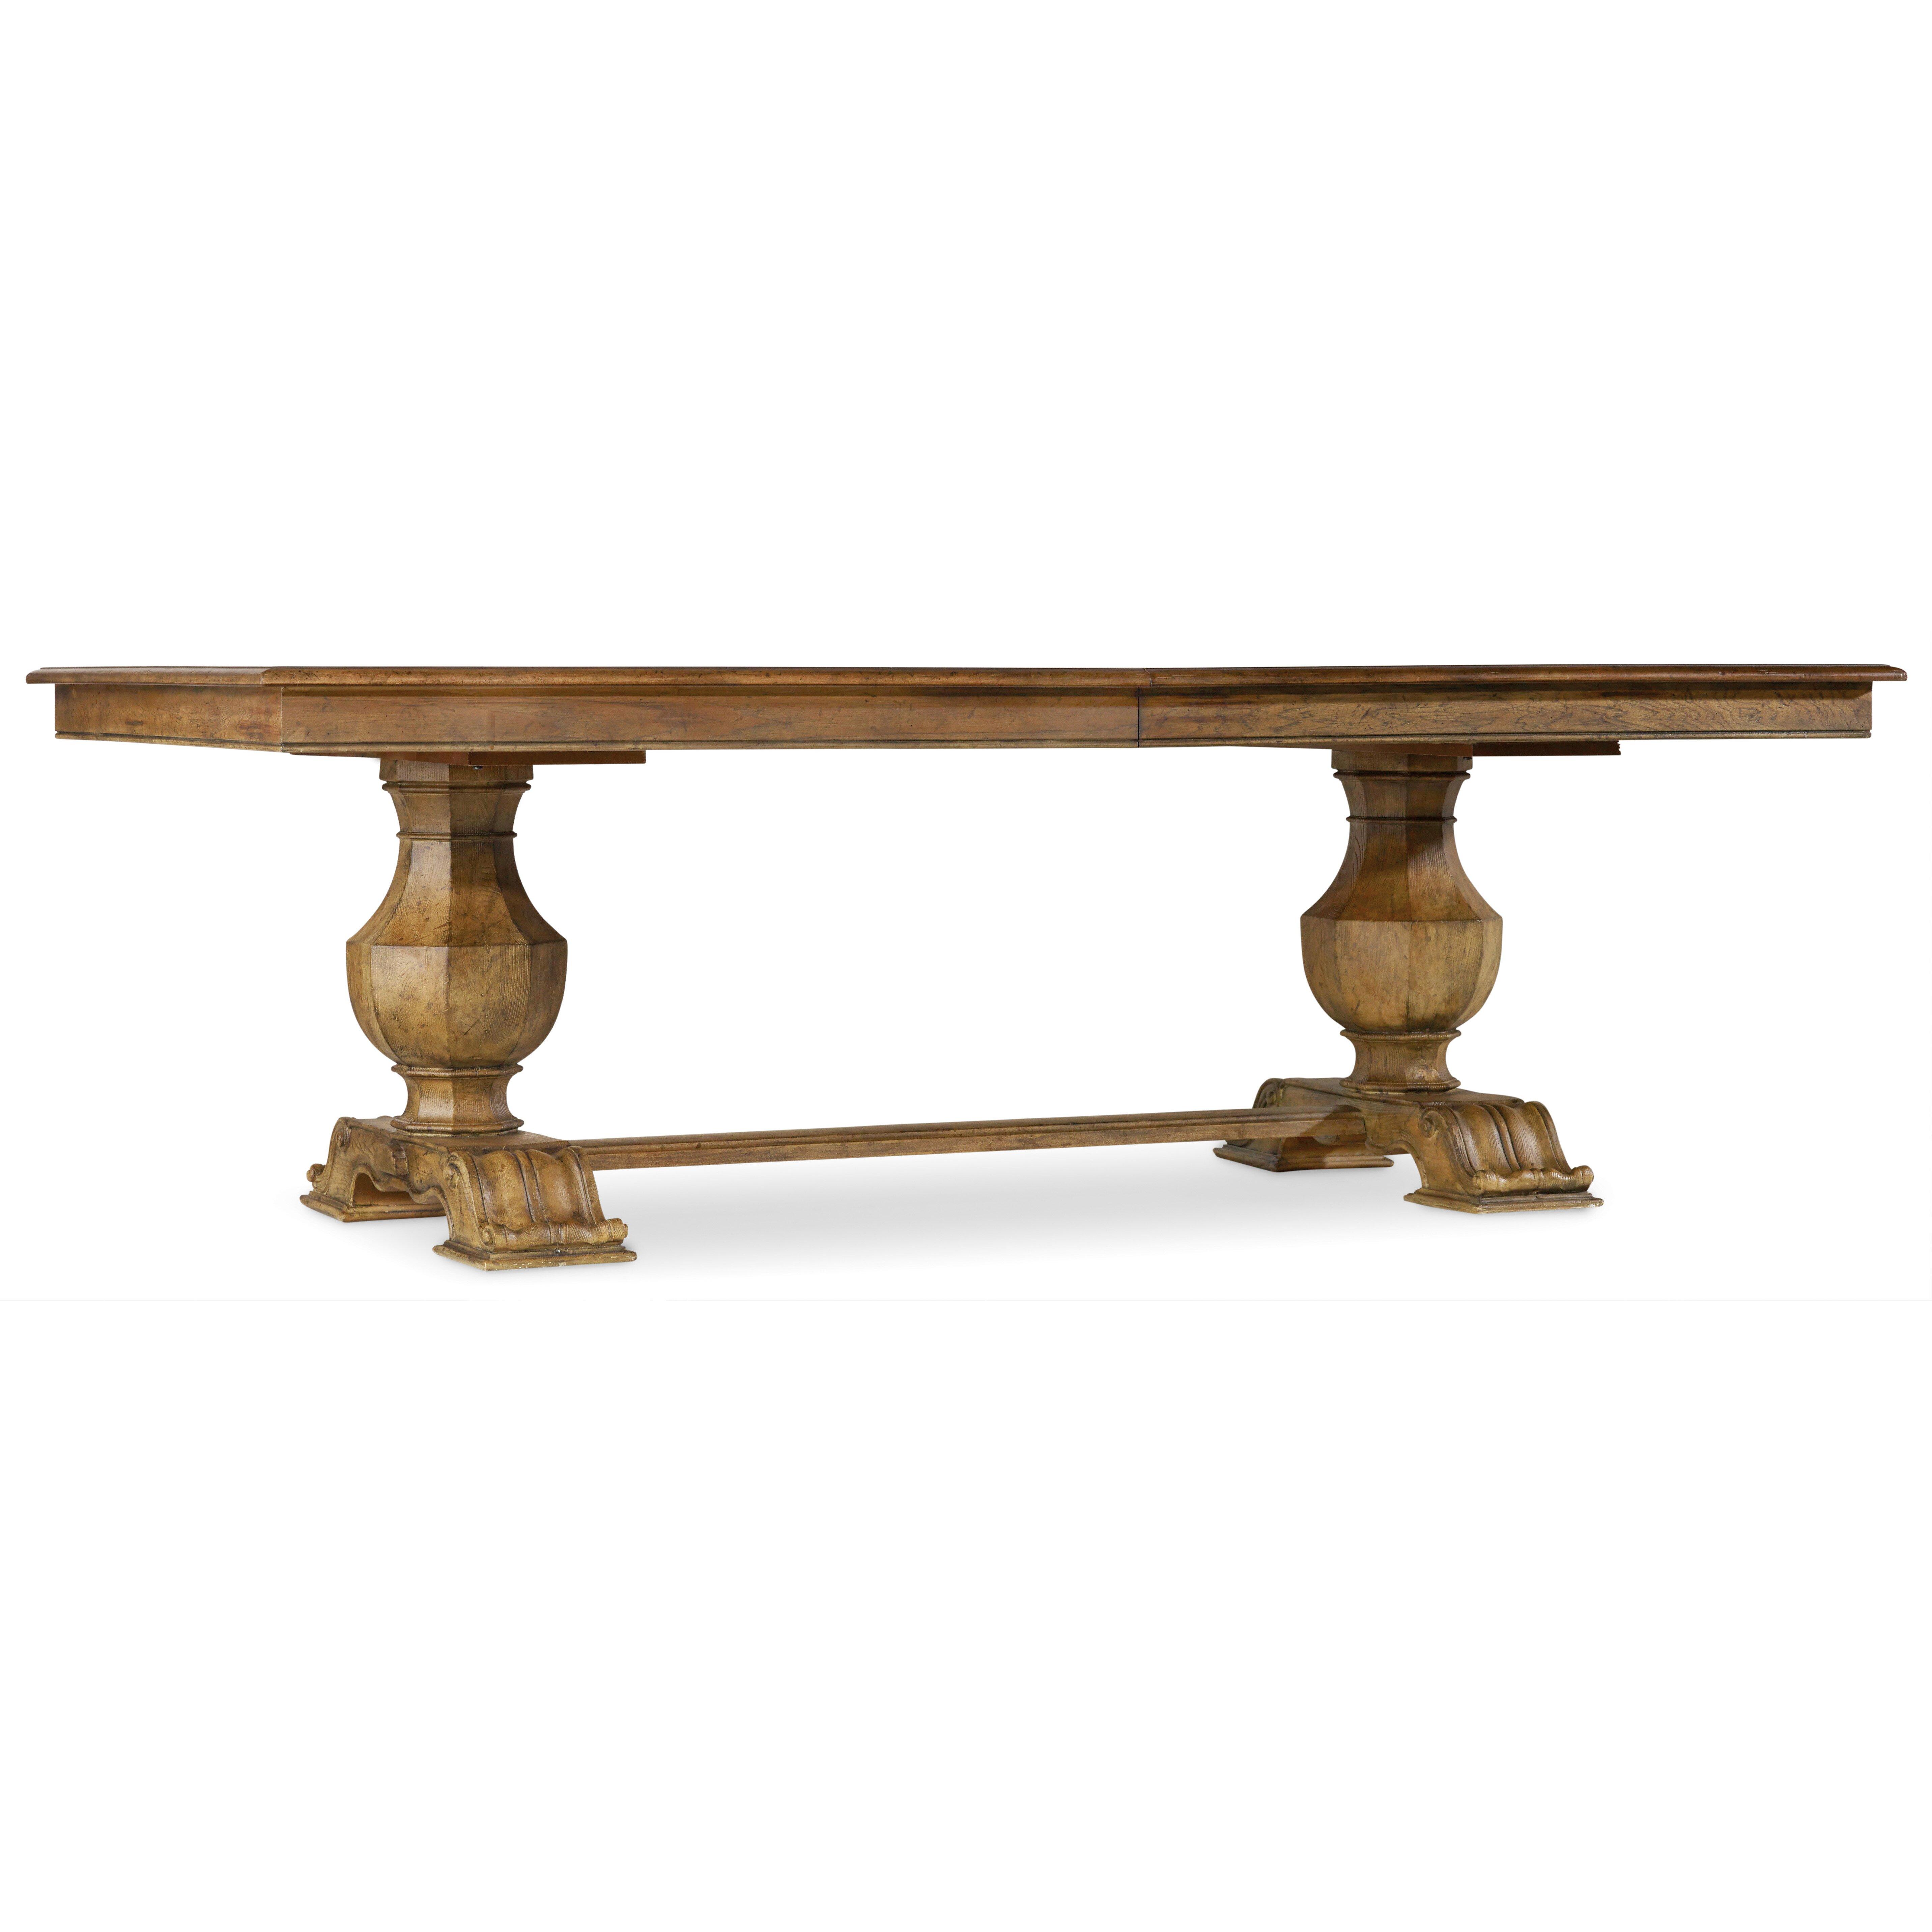 hooker furniture sanctuary dining table base reviews wayfair. Black Bedroom Furniture Sets. Home Design Ideas